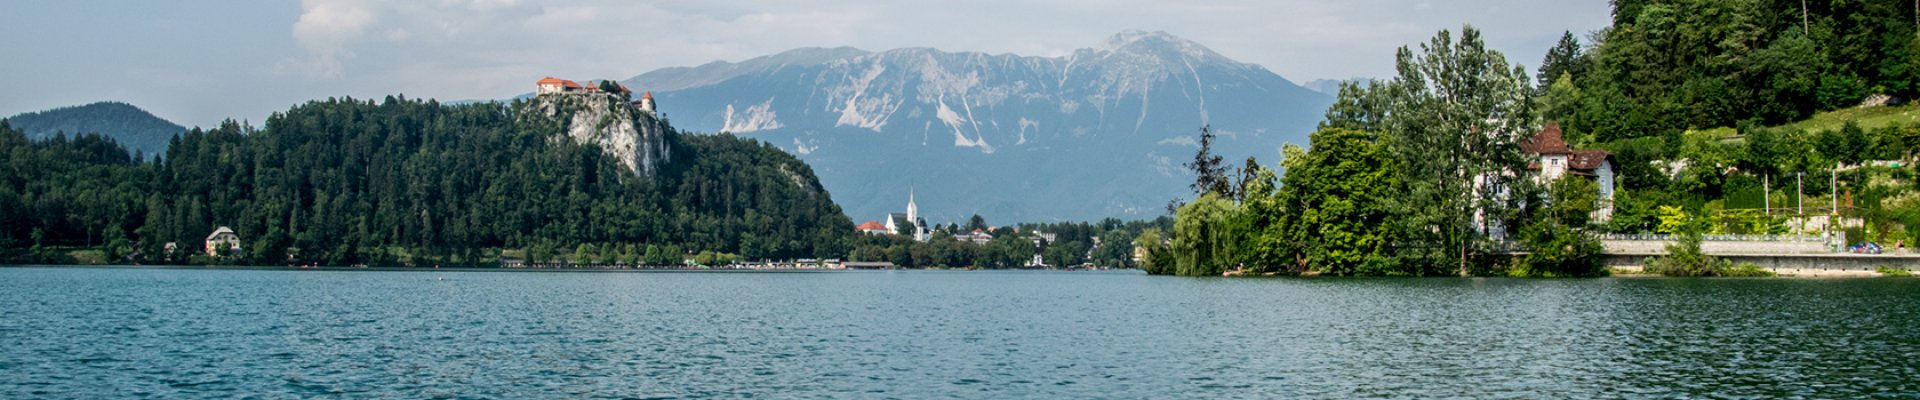 Single reizen Bled actief